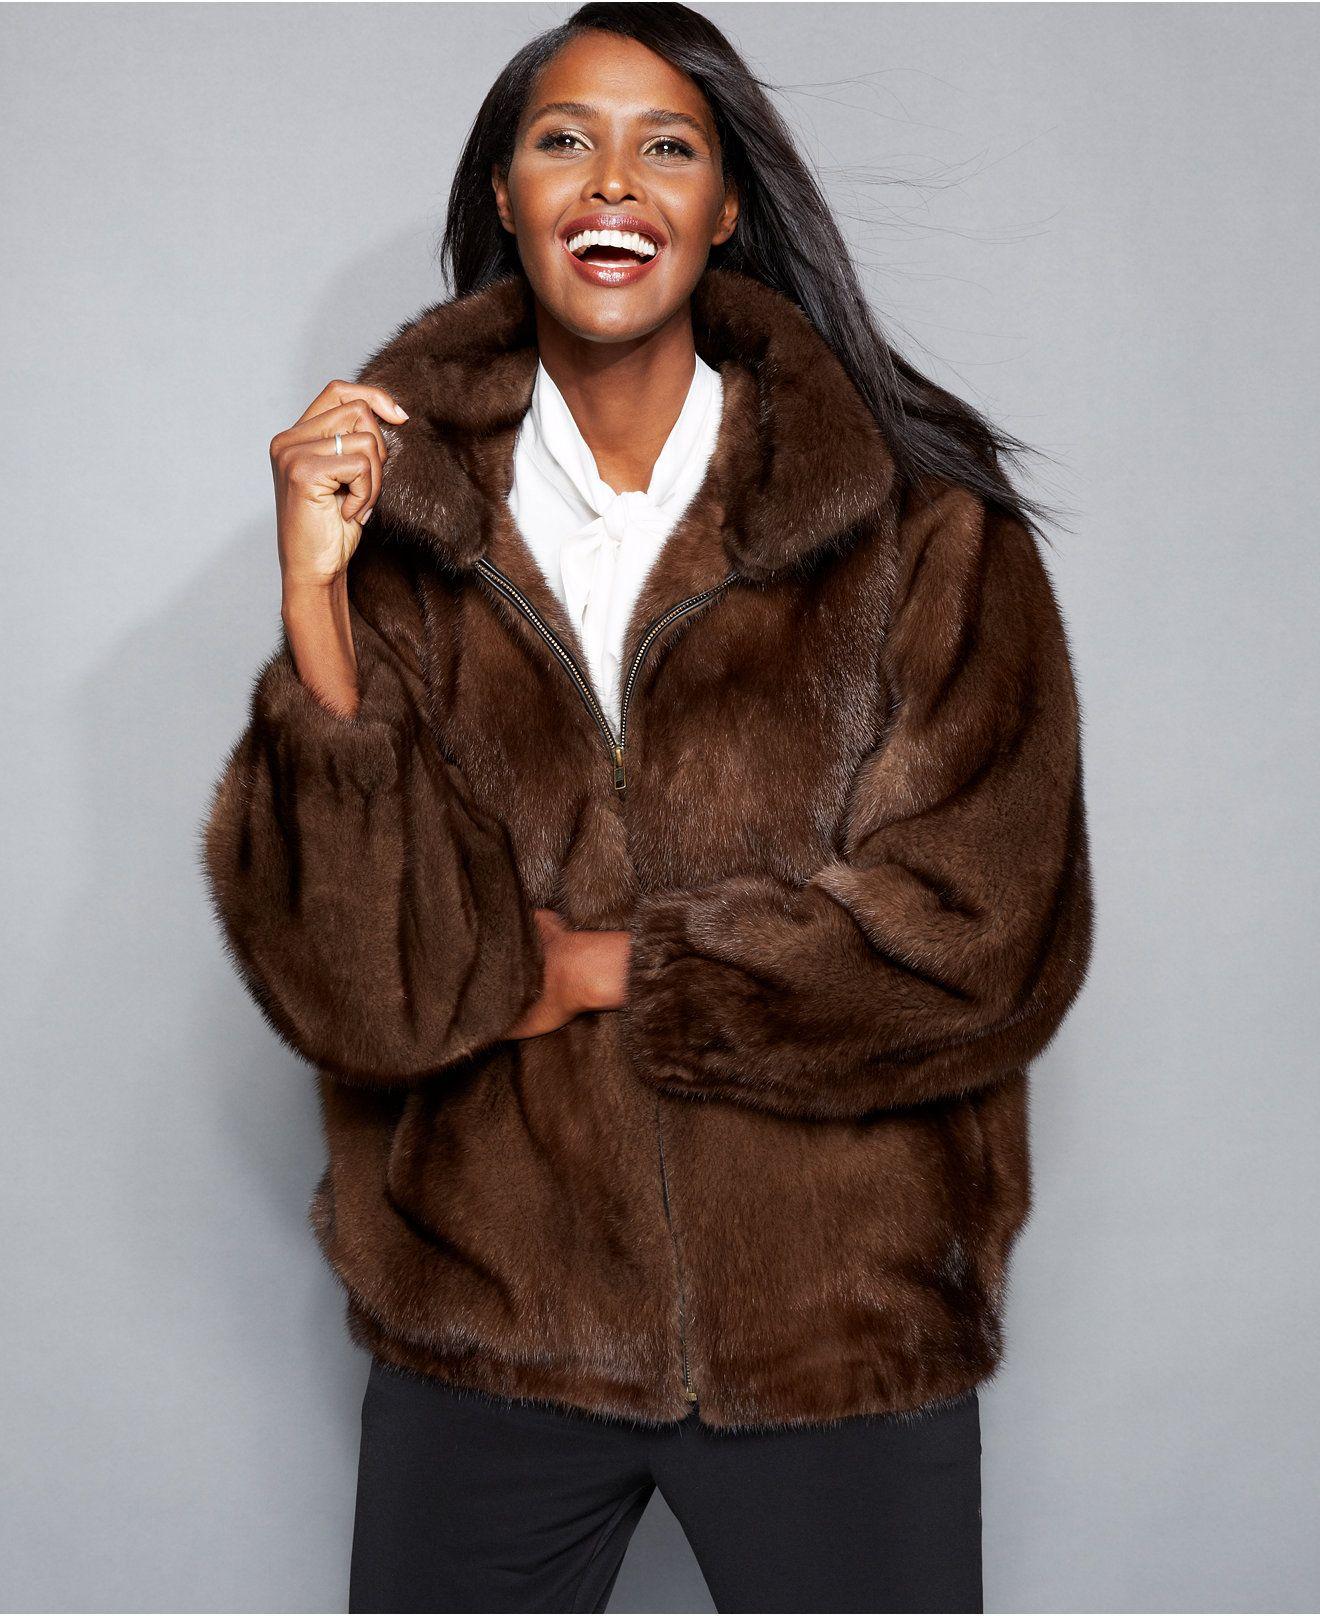 sheared mink bomber jacket for women - Google Search  0e8c9c27787